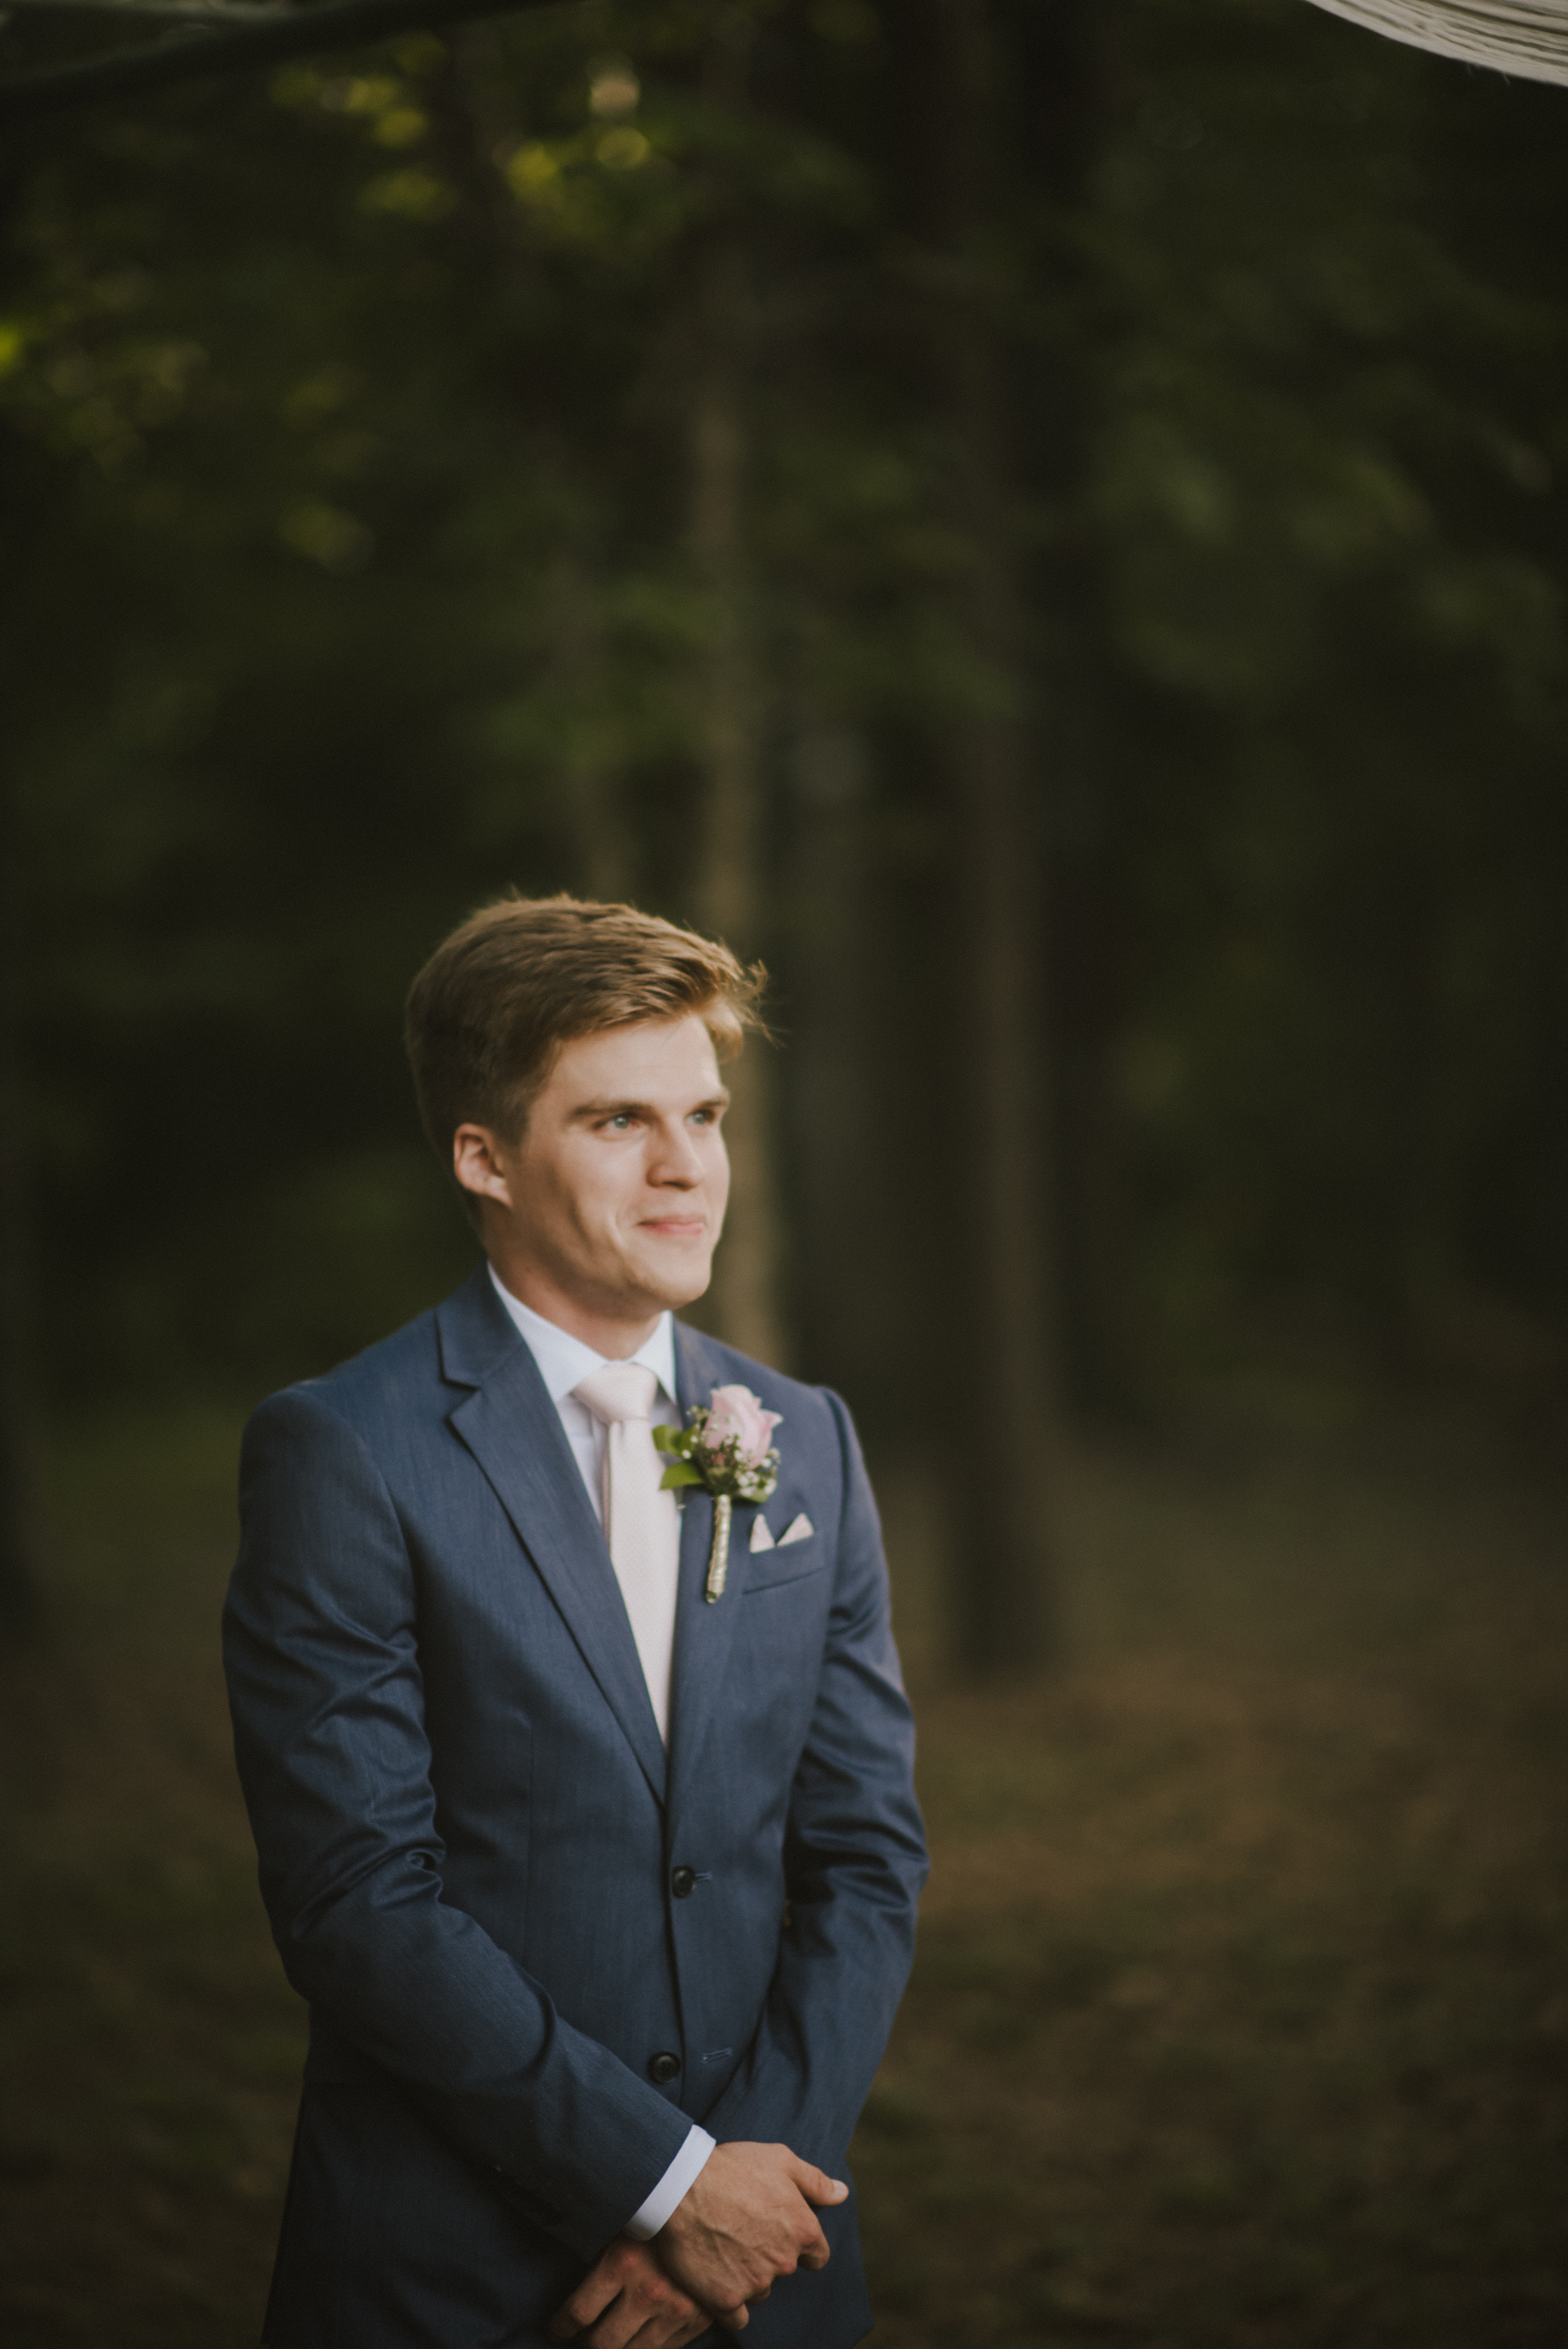 ofRen_weddingphotographer-126.jpg